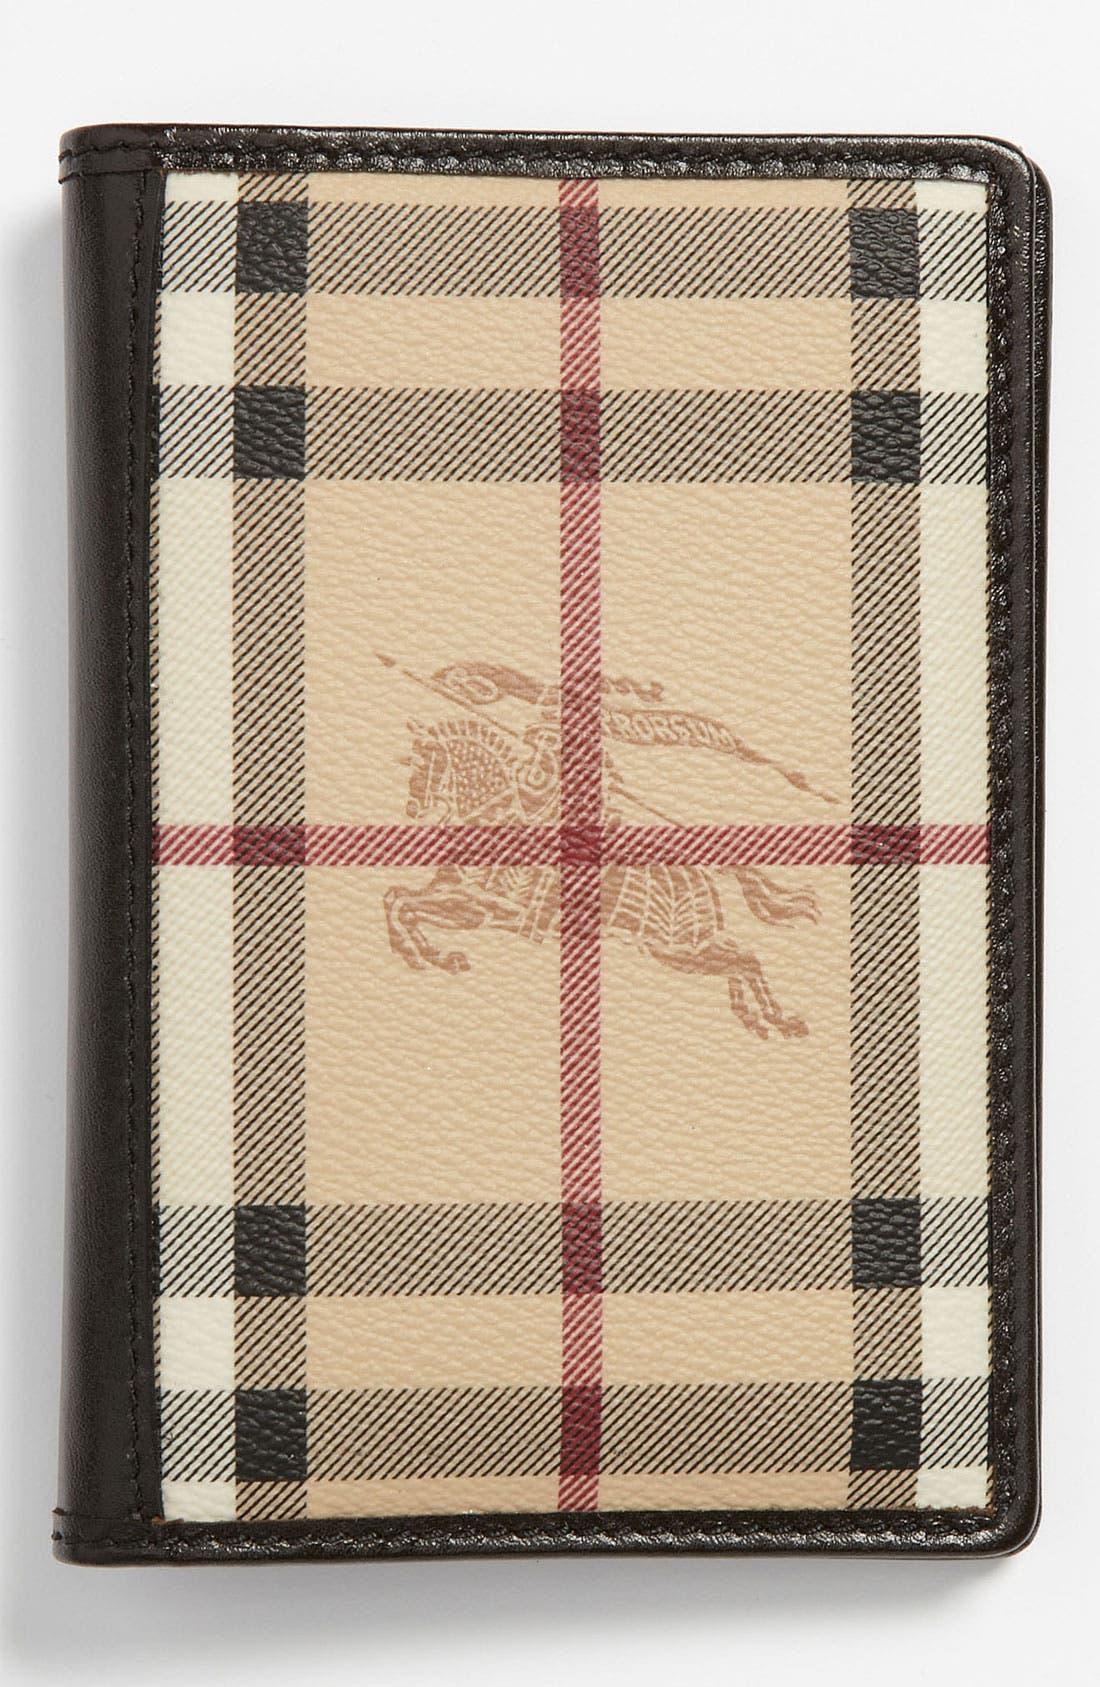 Alternate Image 1 Selected - Burberry 'Haymarket Check' Passport Wallet